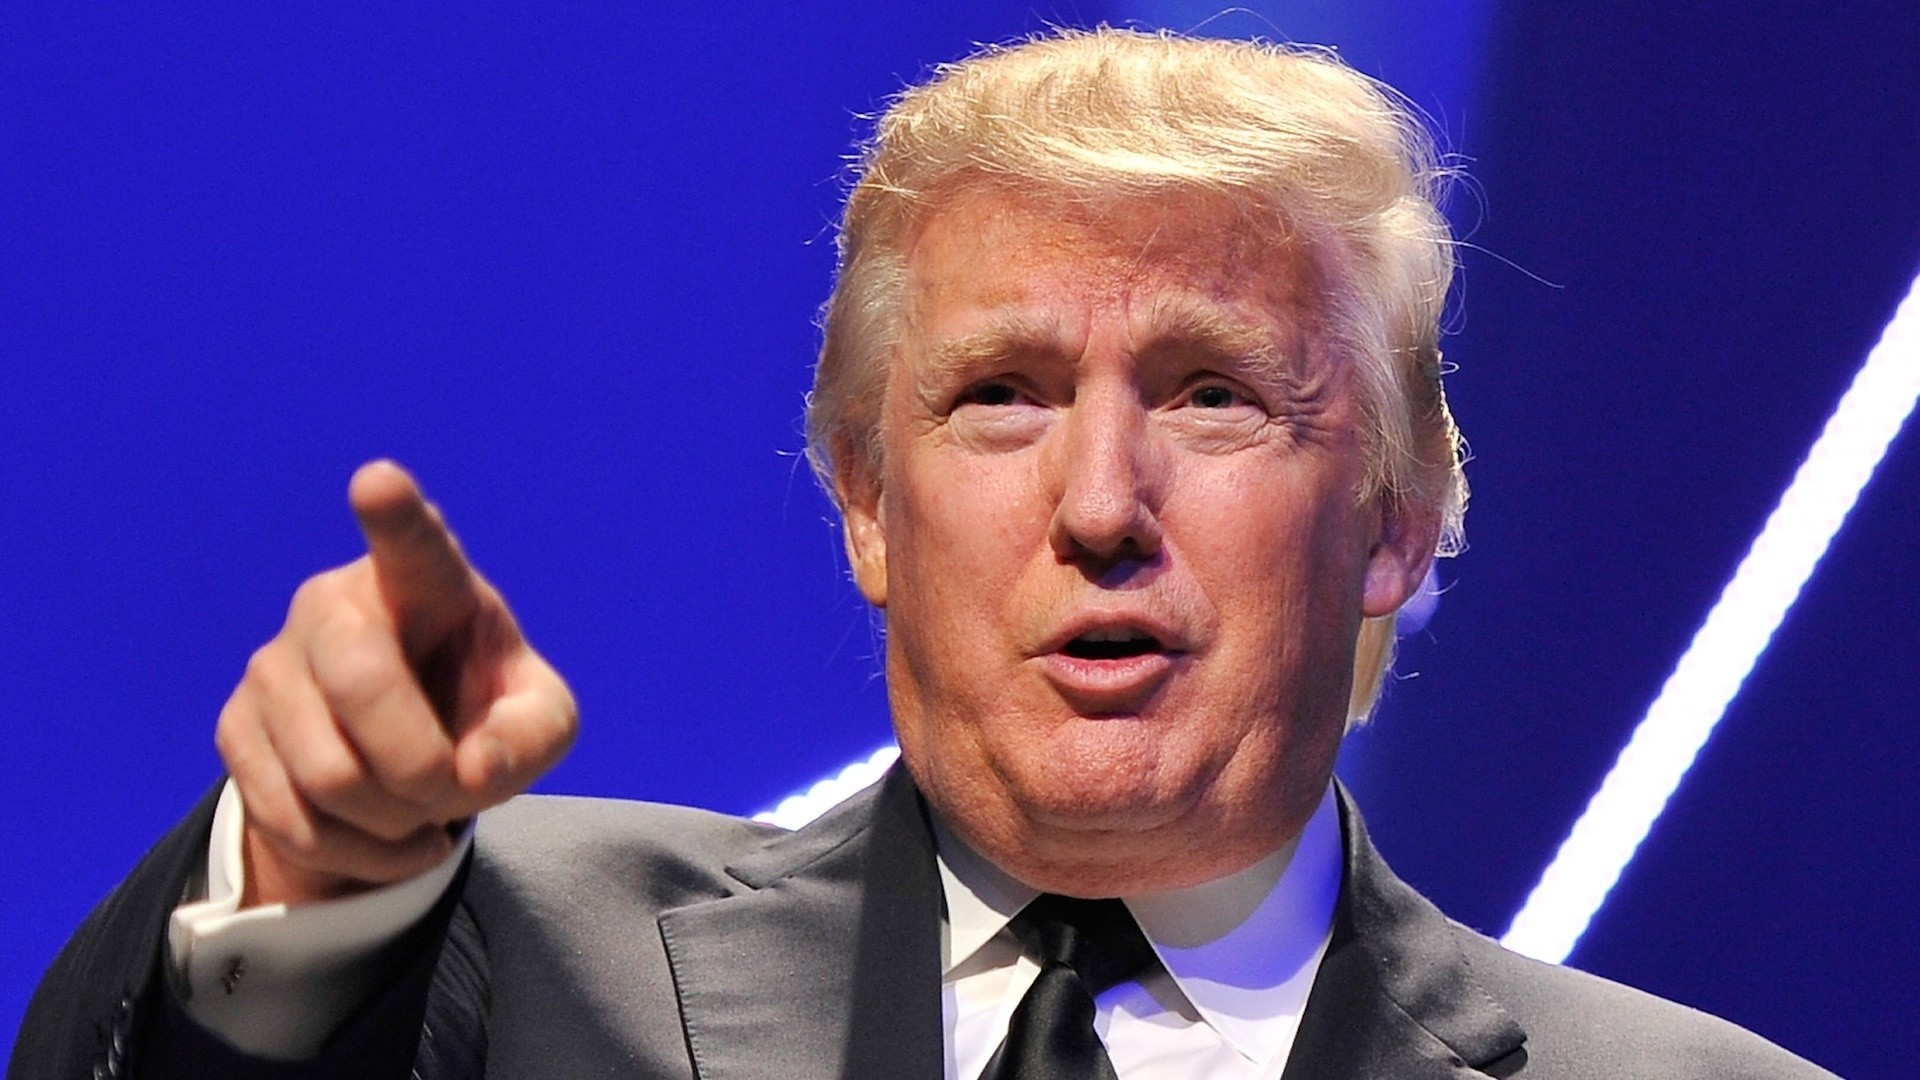 Donald Trump Full HD Wallpaper